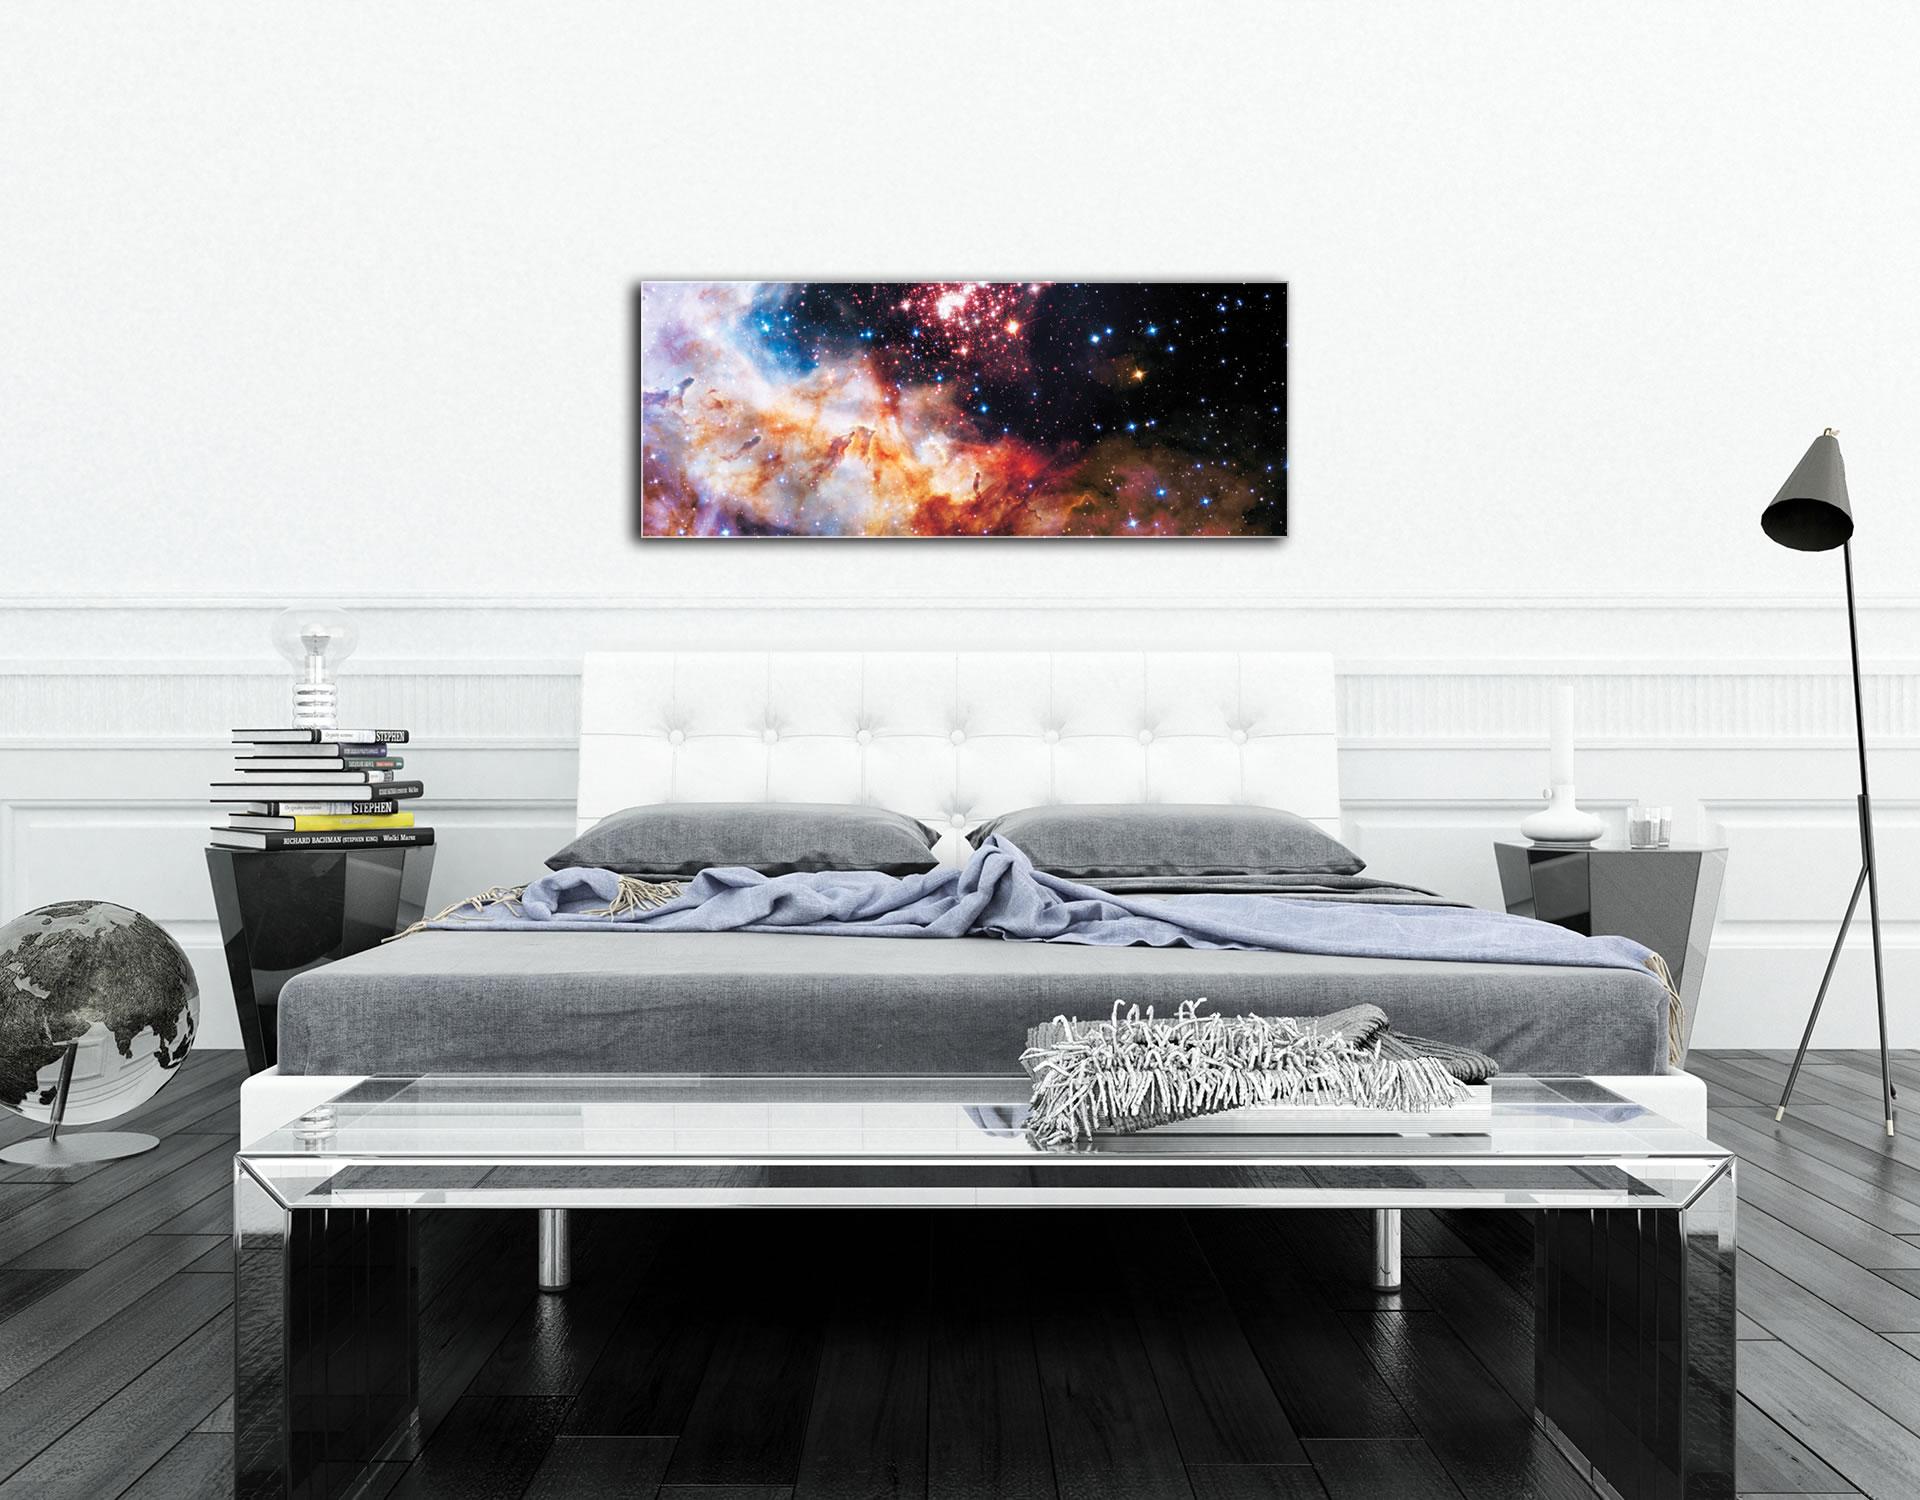 Celestial Fireworks - Modern Wall Decor - Lifestyle Image